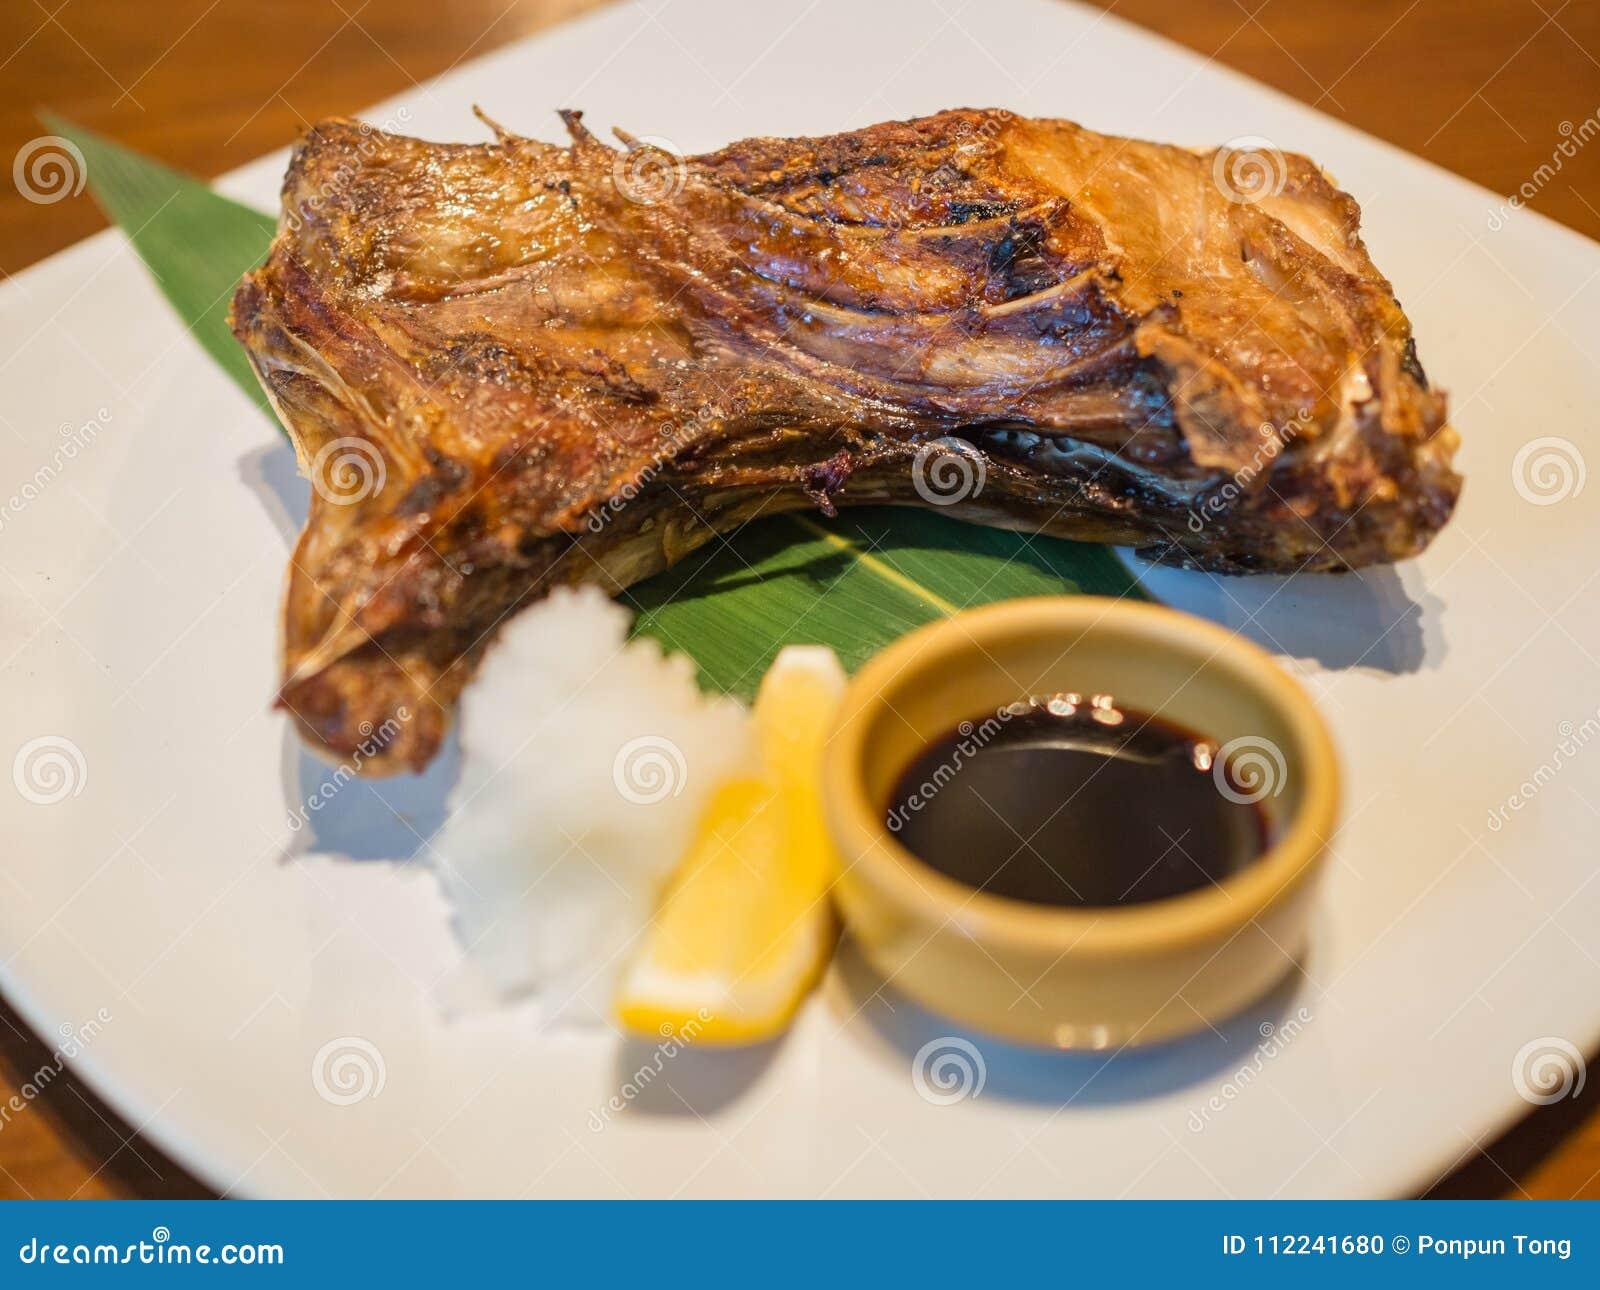 Yellowtail Collar Fish Of Hamachi Kama Japanese Food Stock Photo